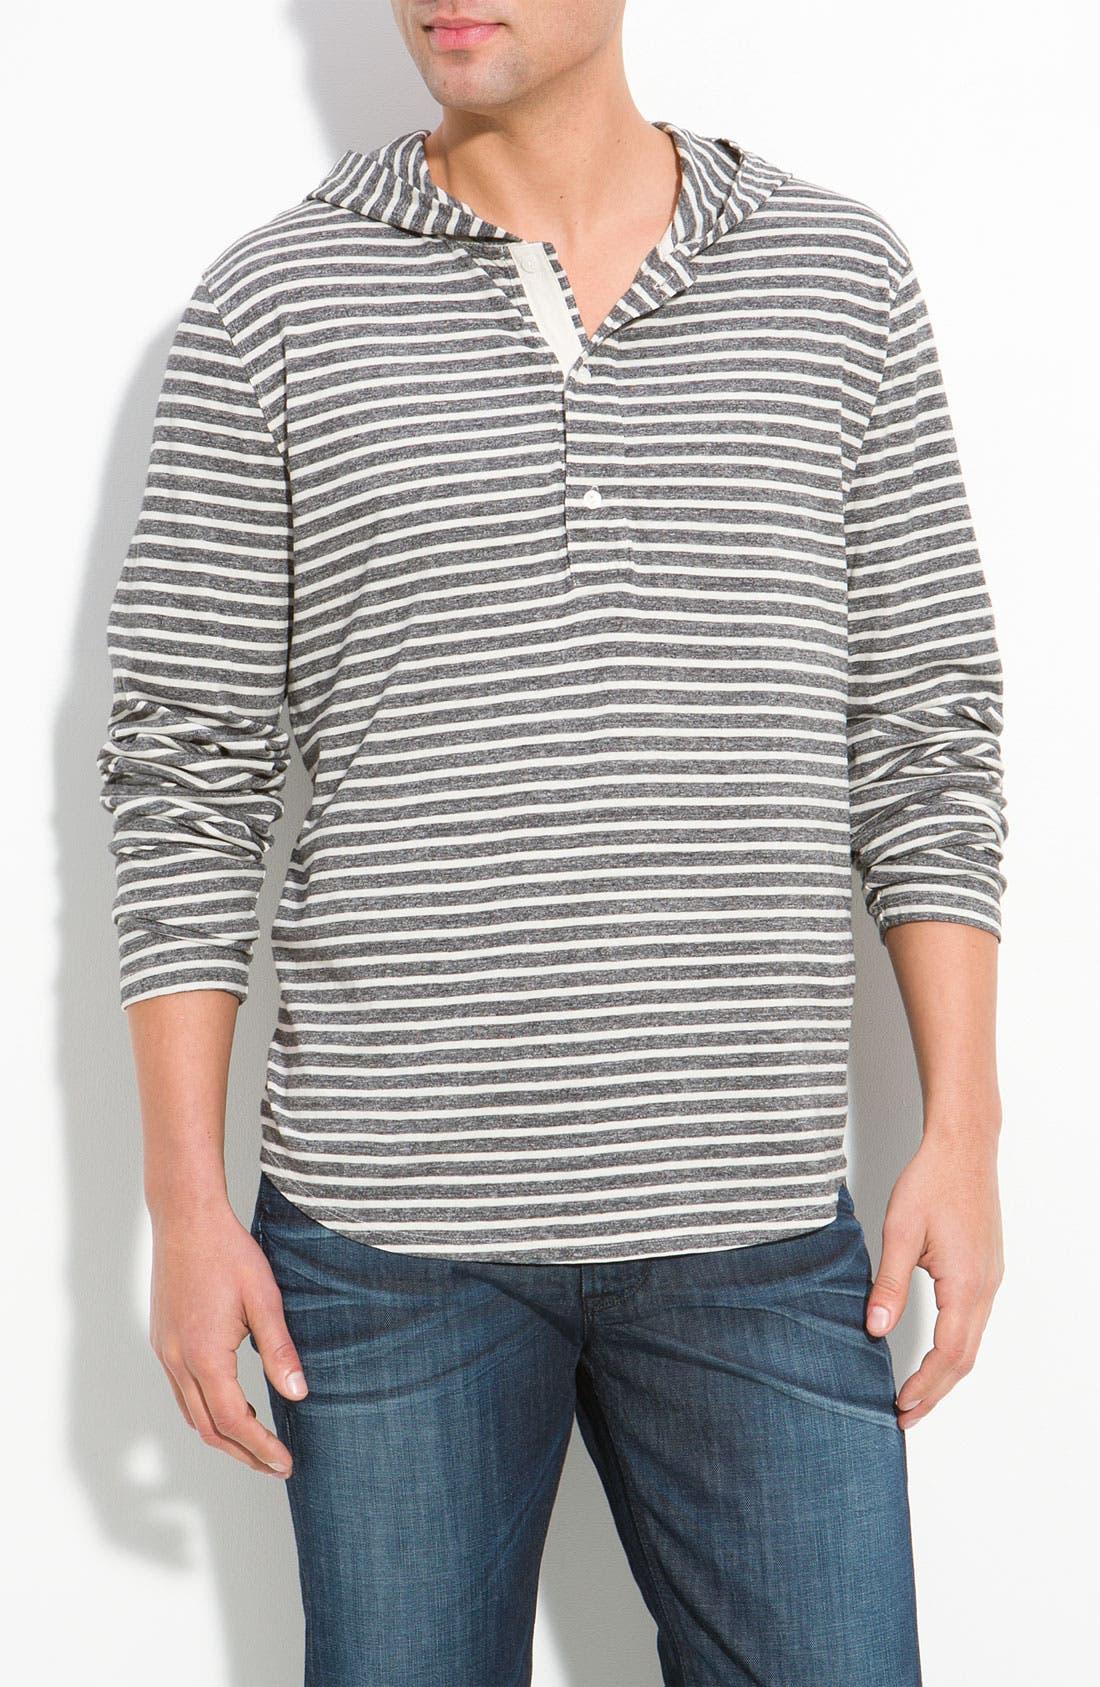 Alternate Image 1 Selected - NSF Clothing 'Stokes' Stripe Henley Hoodie